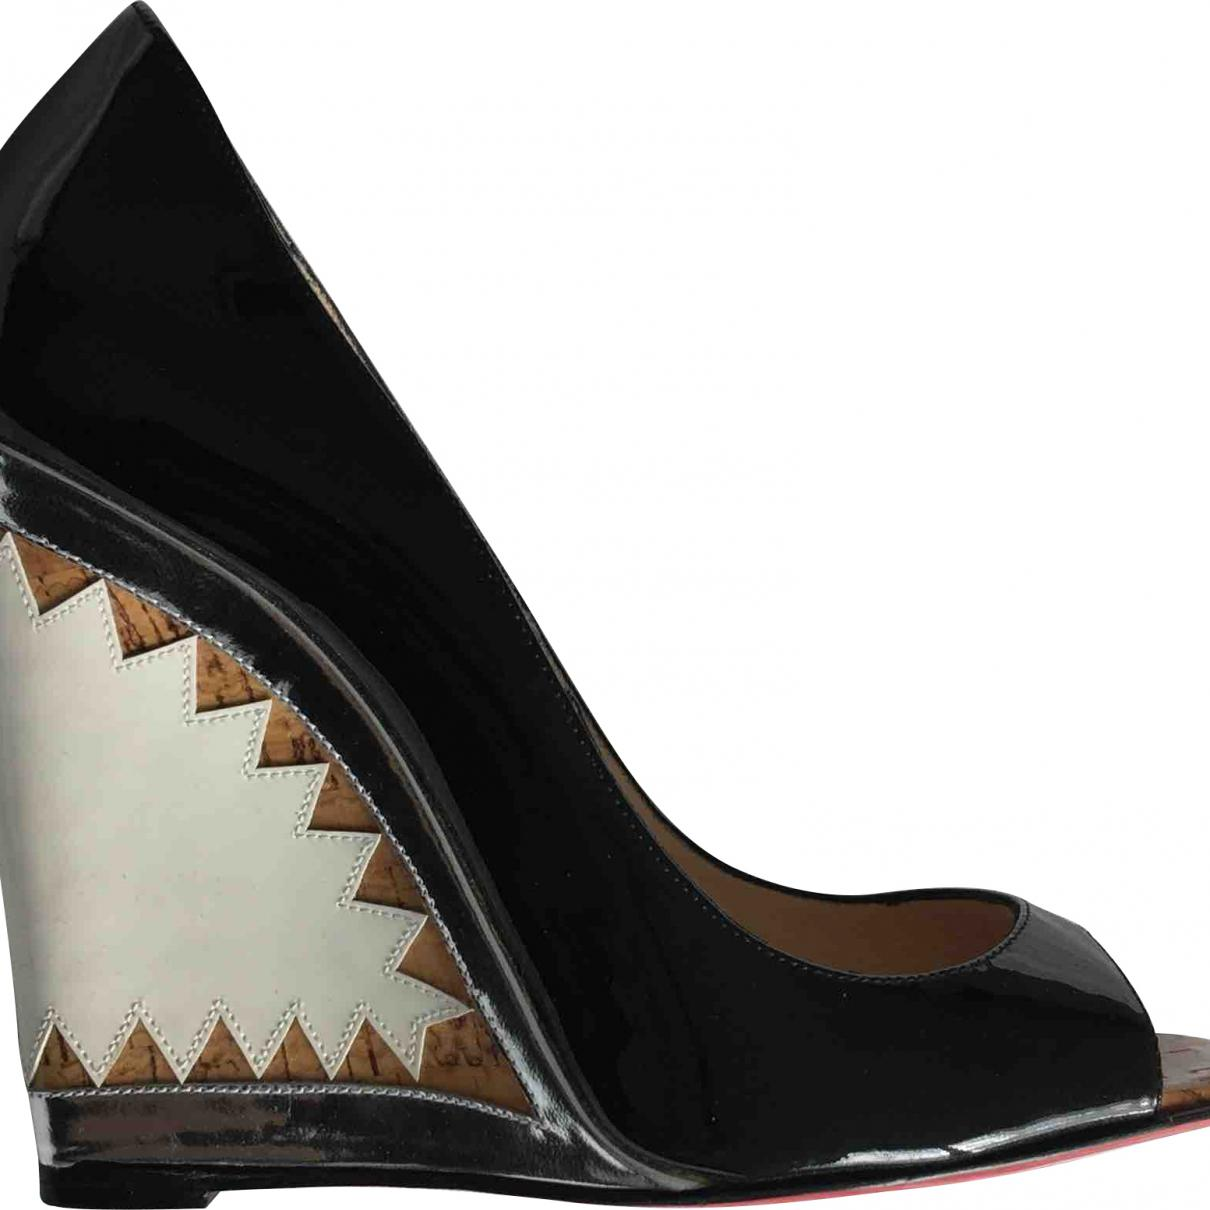 3bafc6daaaf Lyst - Christian Louboutin Patent Leather Heels in Black